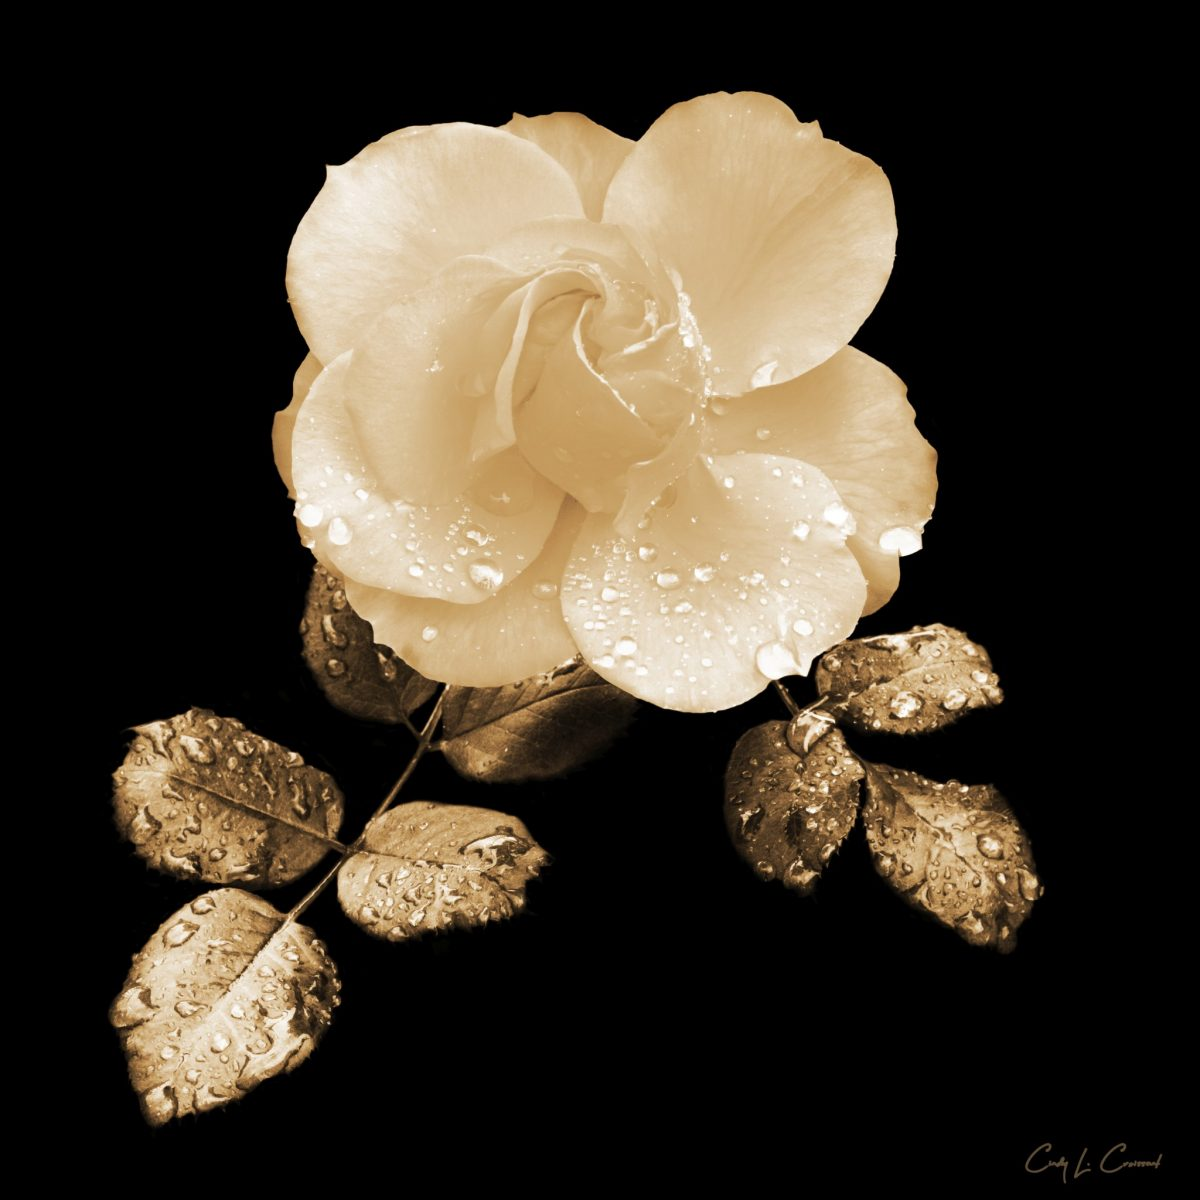 Cindy Croissant - Rain on a Rose